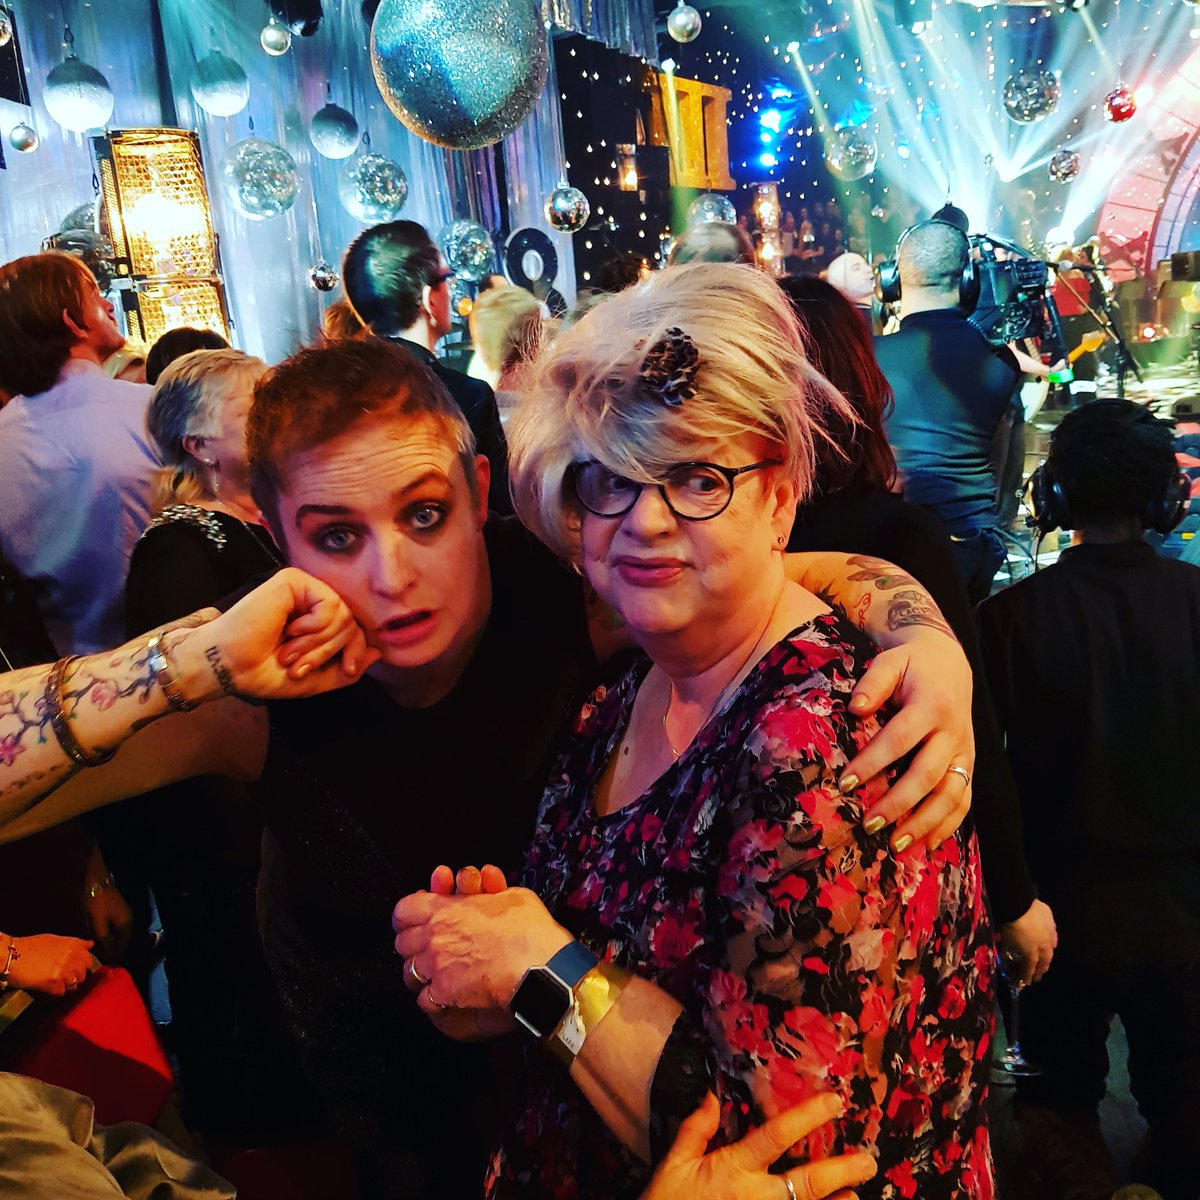 @iamjobrand #hootenanny #smashed #wig #nye https://t.co/oxCBq0W0Up